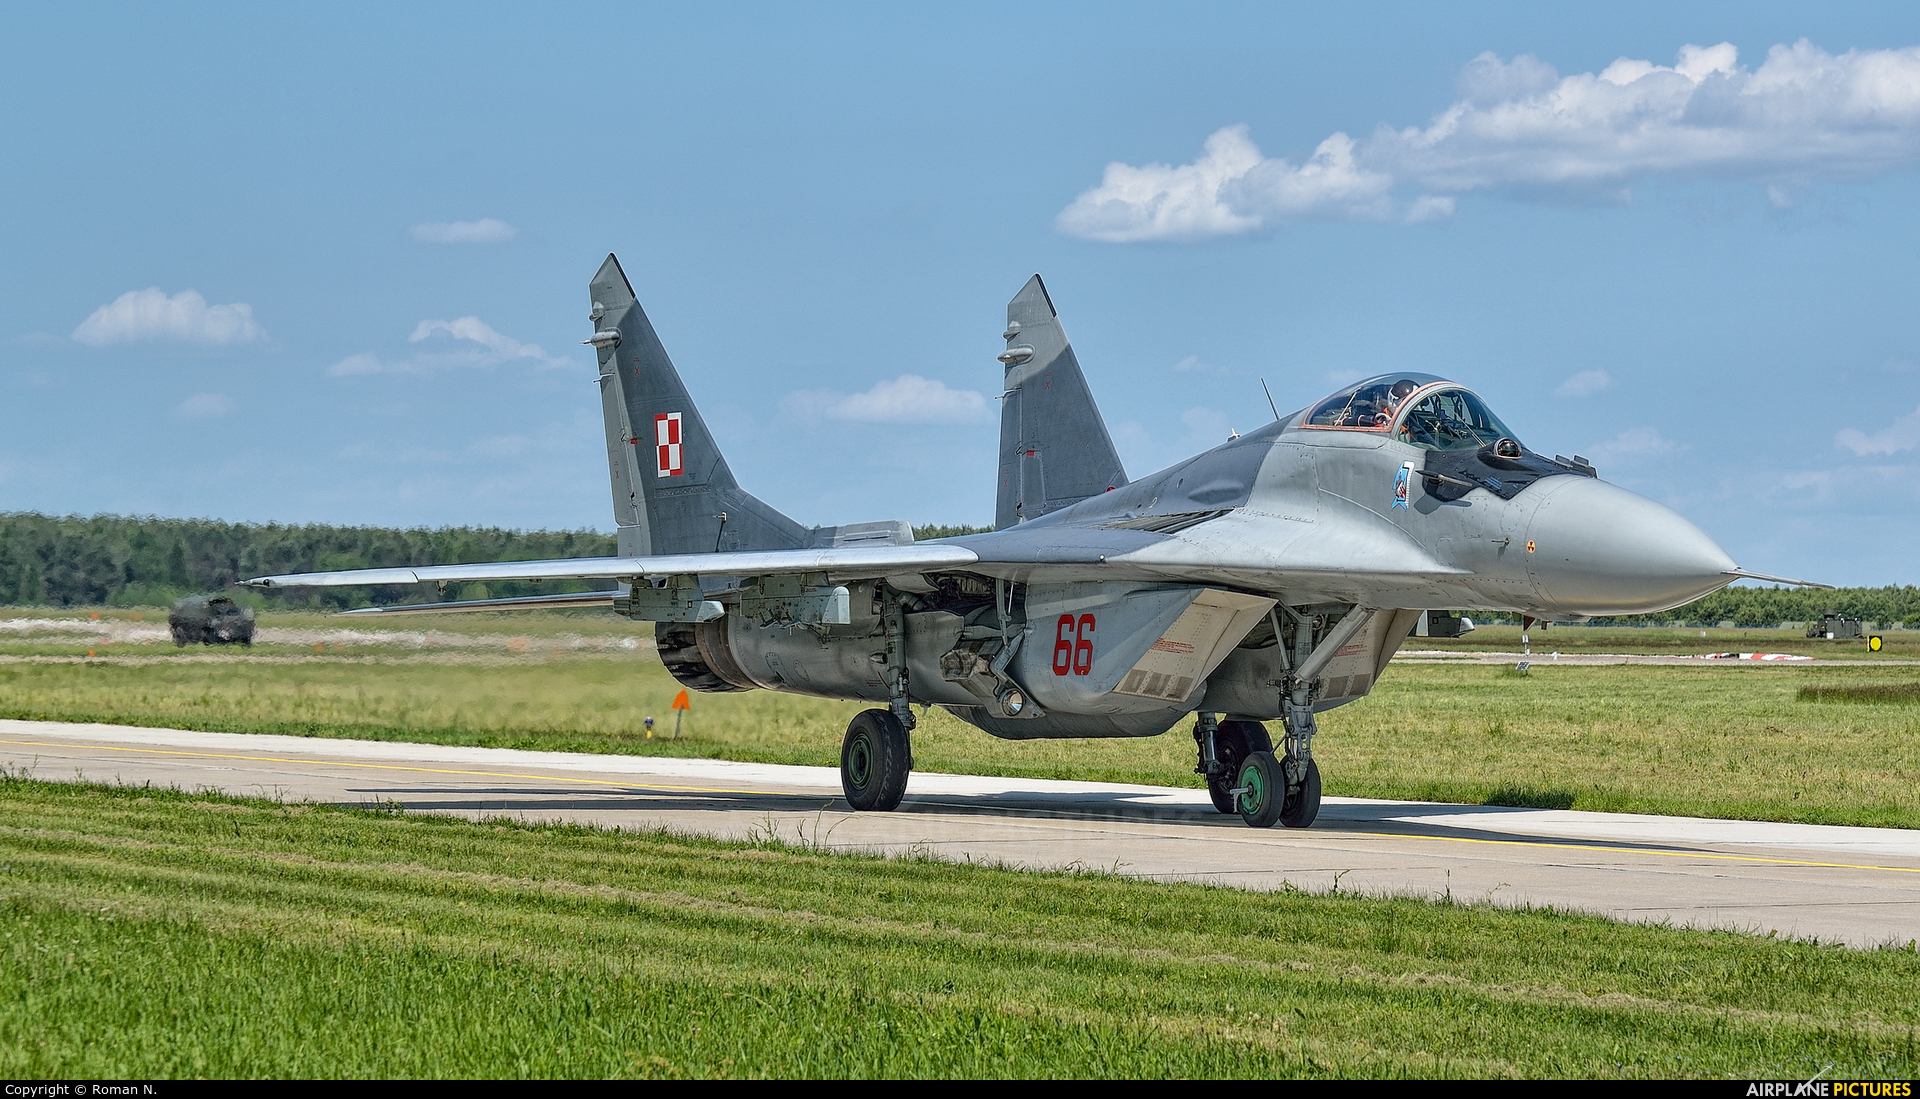 Poland - Air Force 66 aircraft at Mirosławiec